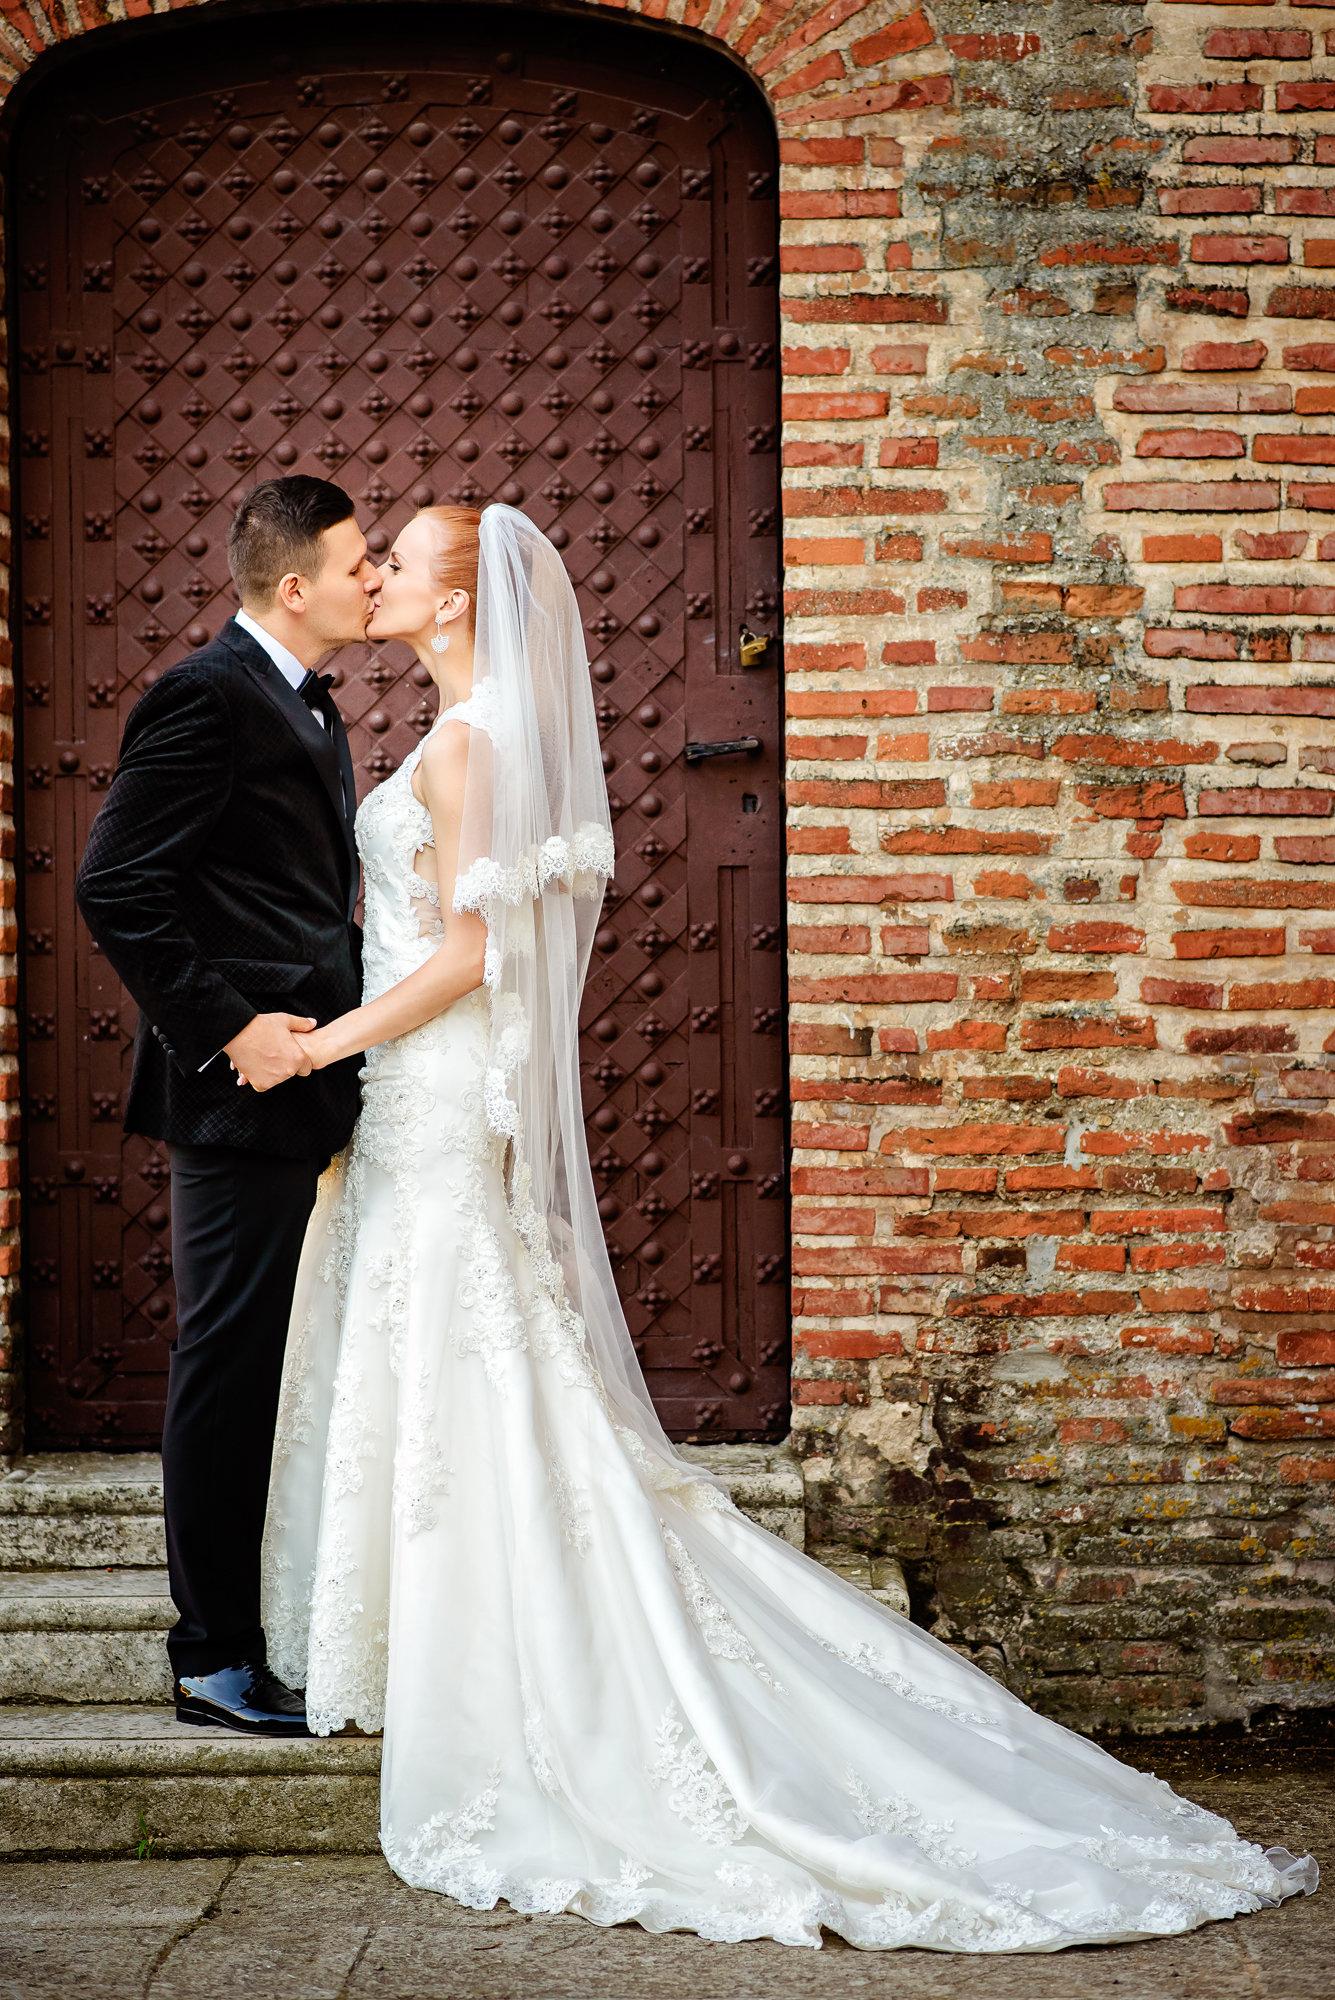 alexandru madalina wedding day 38